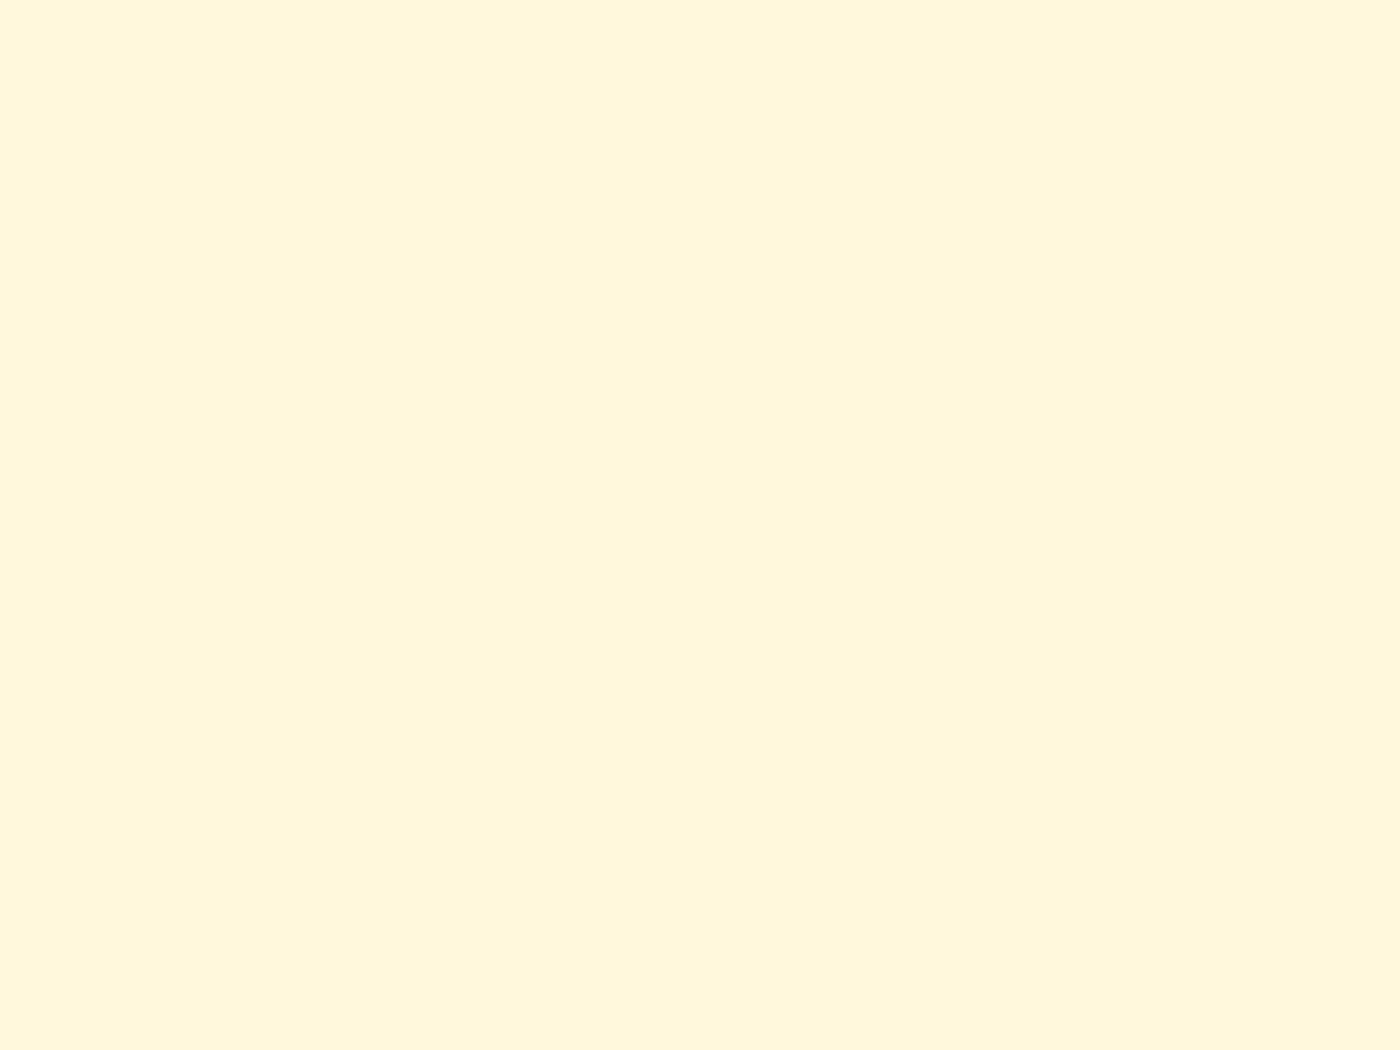 1400x1050 Cornsilk Solid Color Background